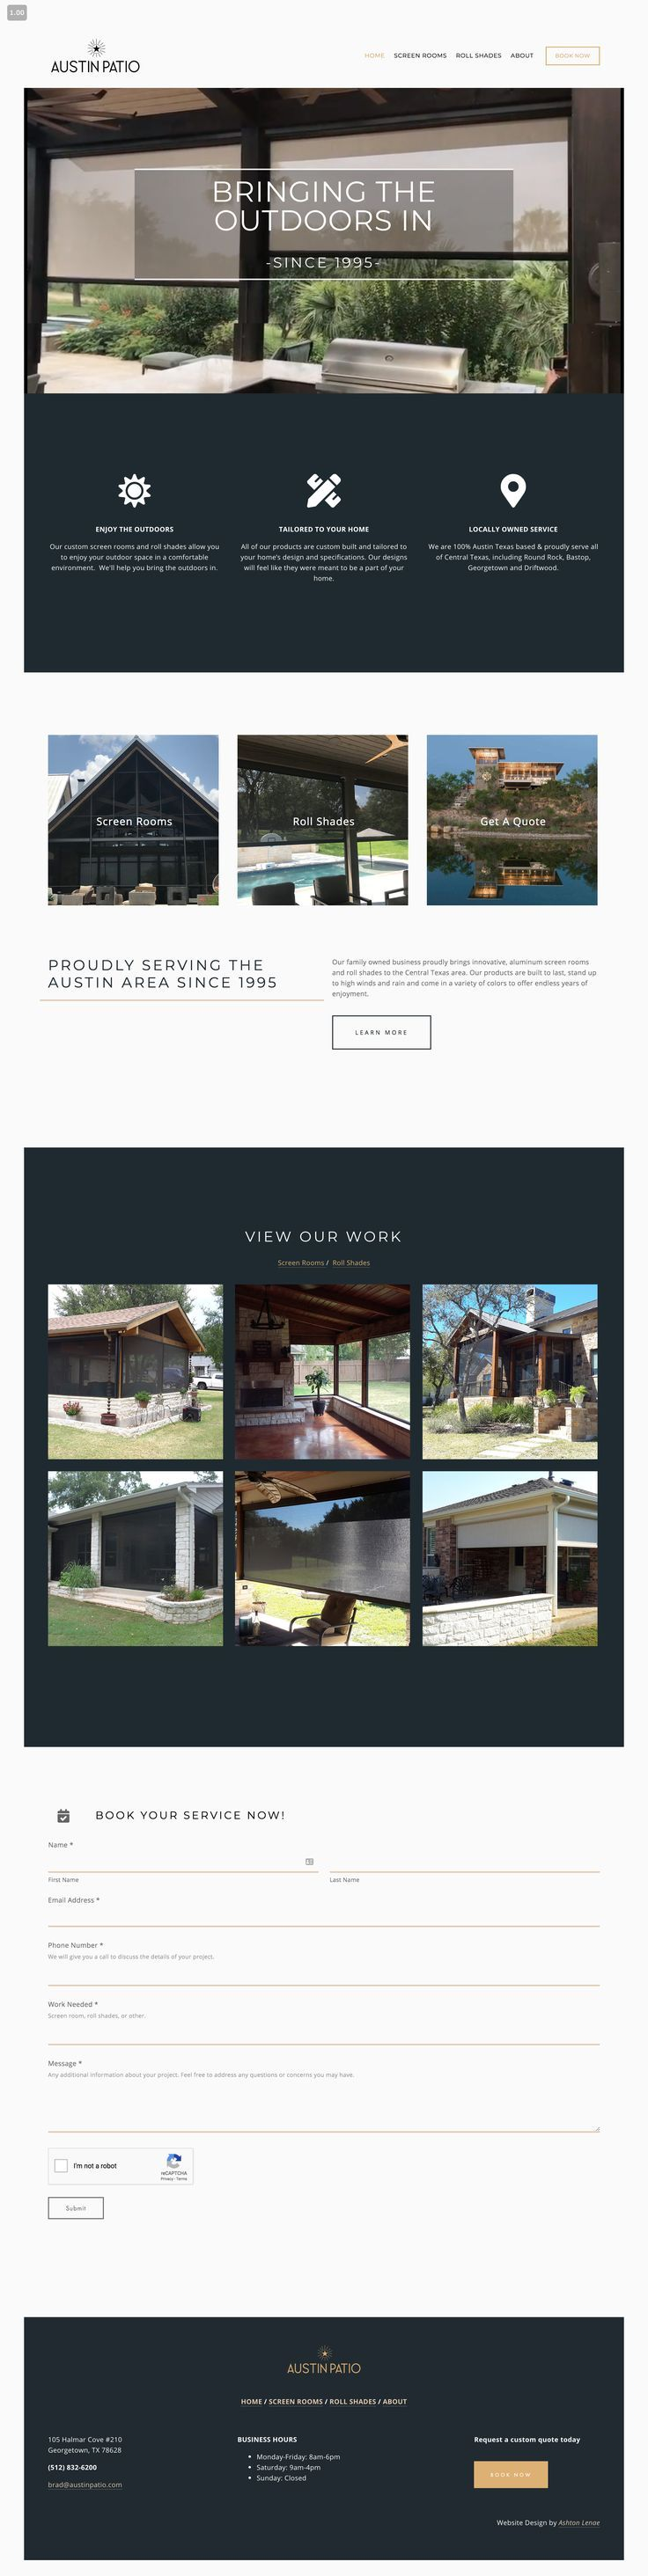 Brand And Website Design For Austin Patio Elegant And Masculine Branding Brand Design For L Blog Design Inspiration Brand Board Design Web Development Design